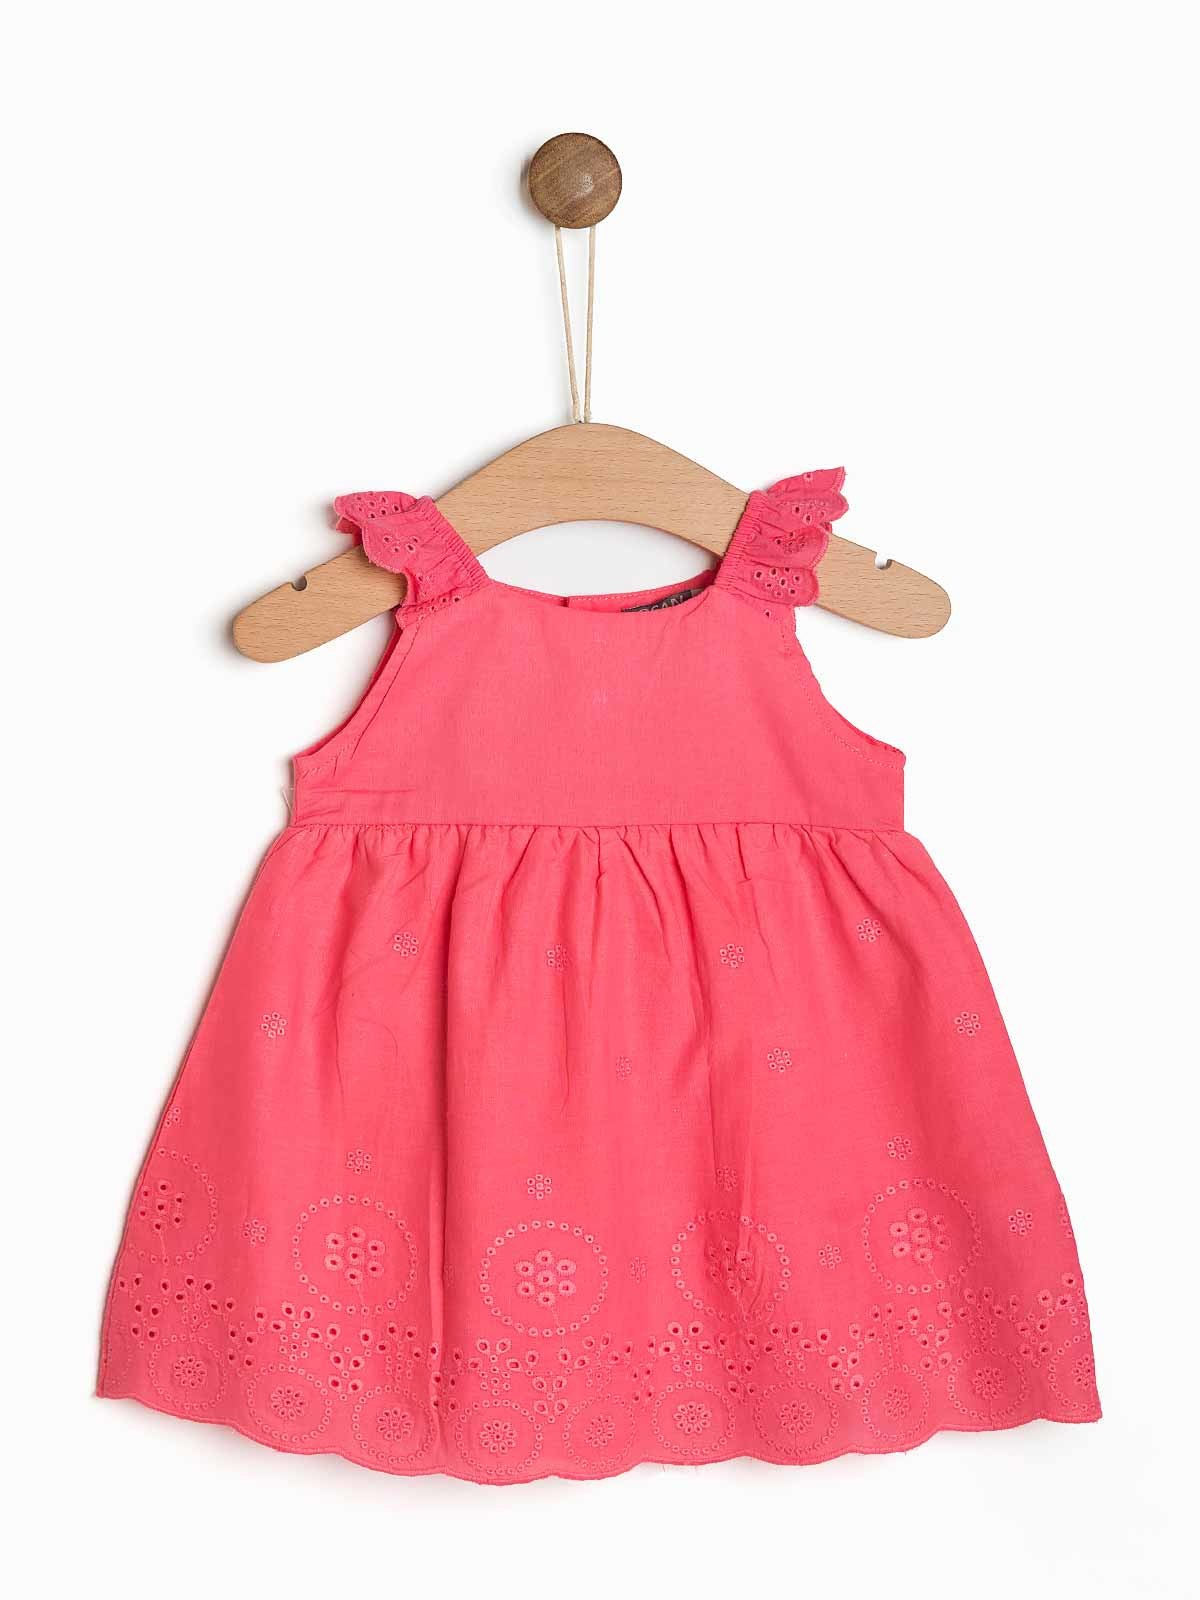 Vestido de bebé bordado com cueca